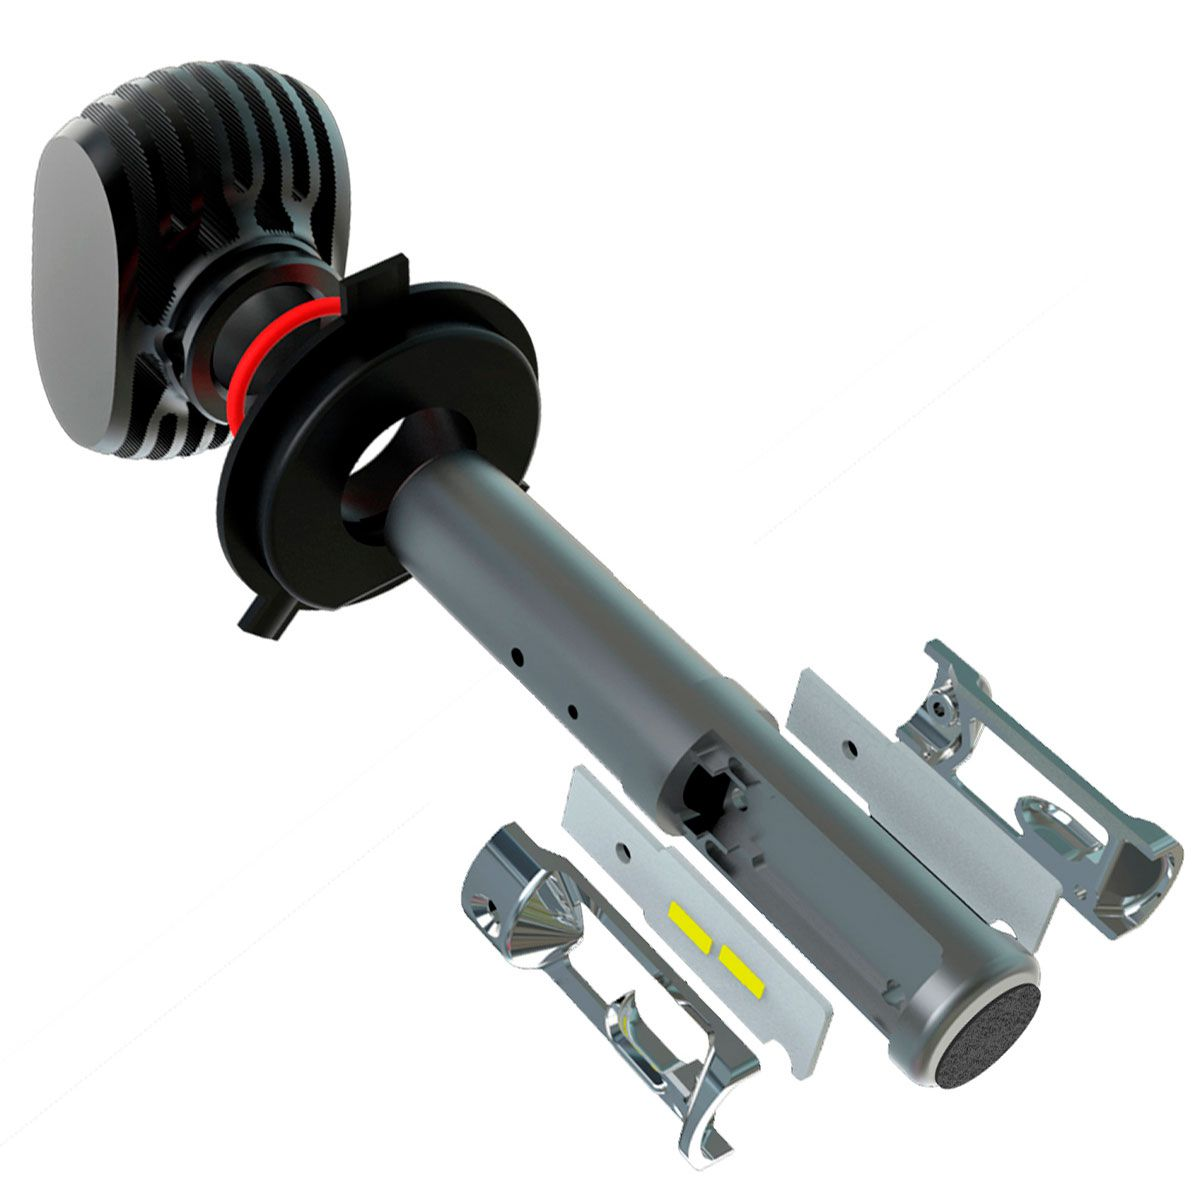 Kit Ultra LED Gol G6 2013 2014 2015 2016 tipo xenon farol de milha H11 50W